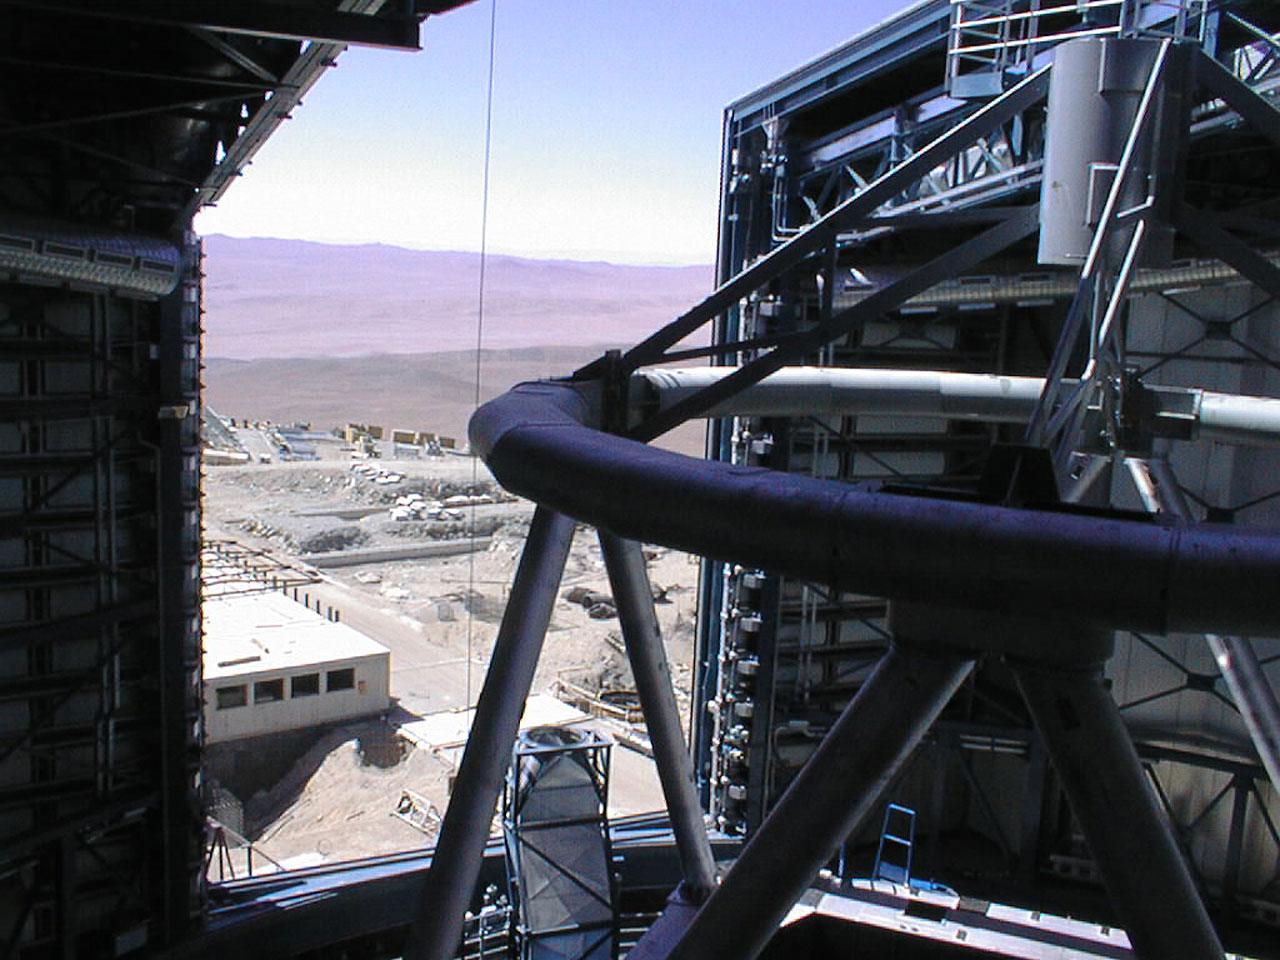 The View form the Unit Telescope 1 Enclosure